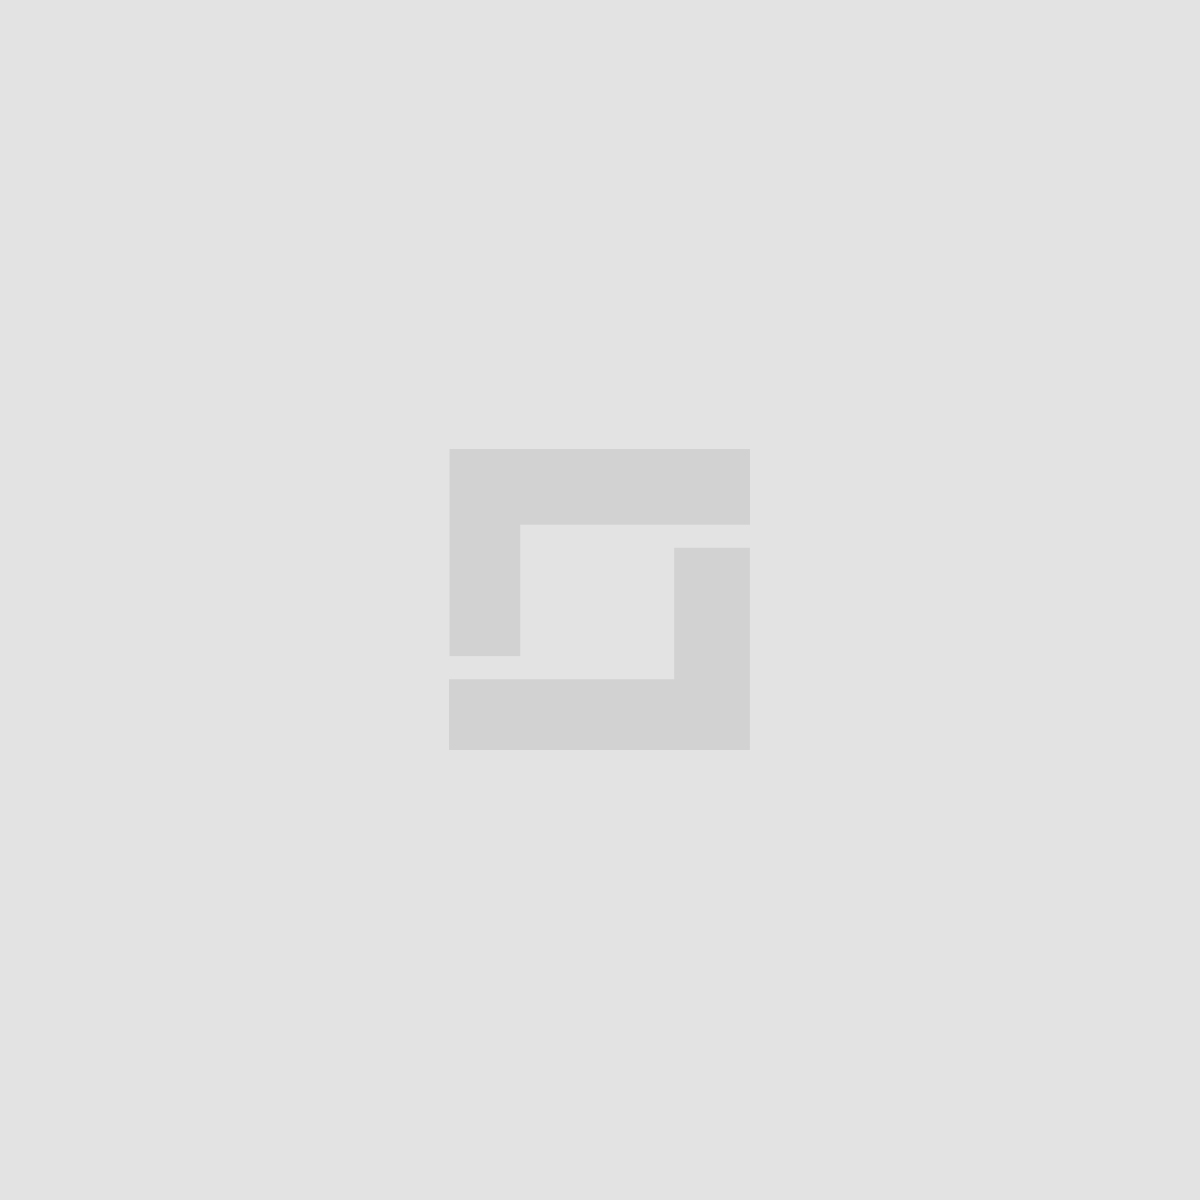 Merveilleux Raj Blend Classic Sandstone Calibrated Paving Slabs